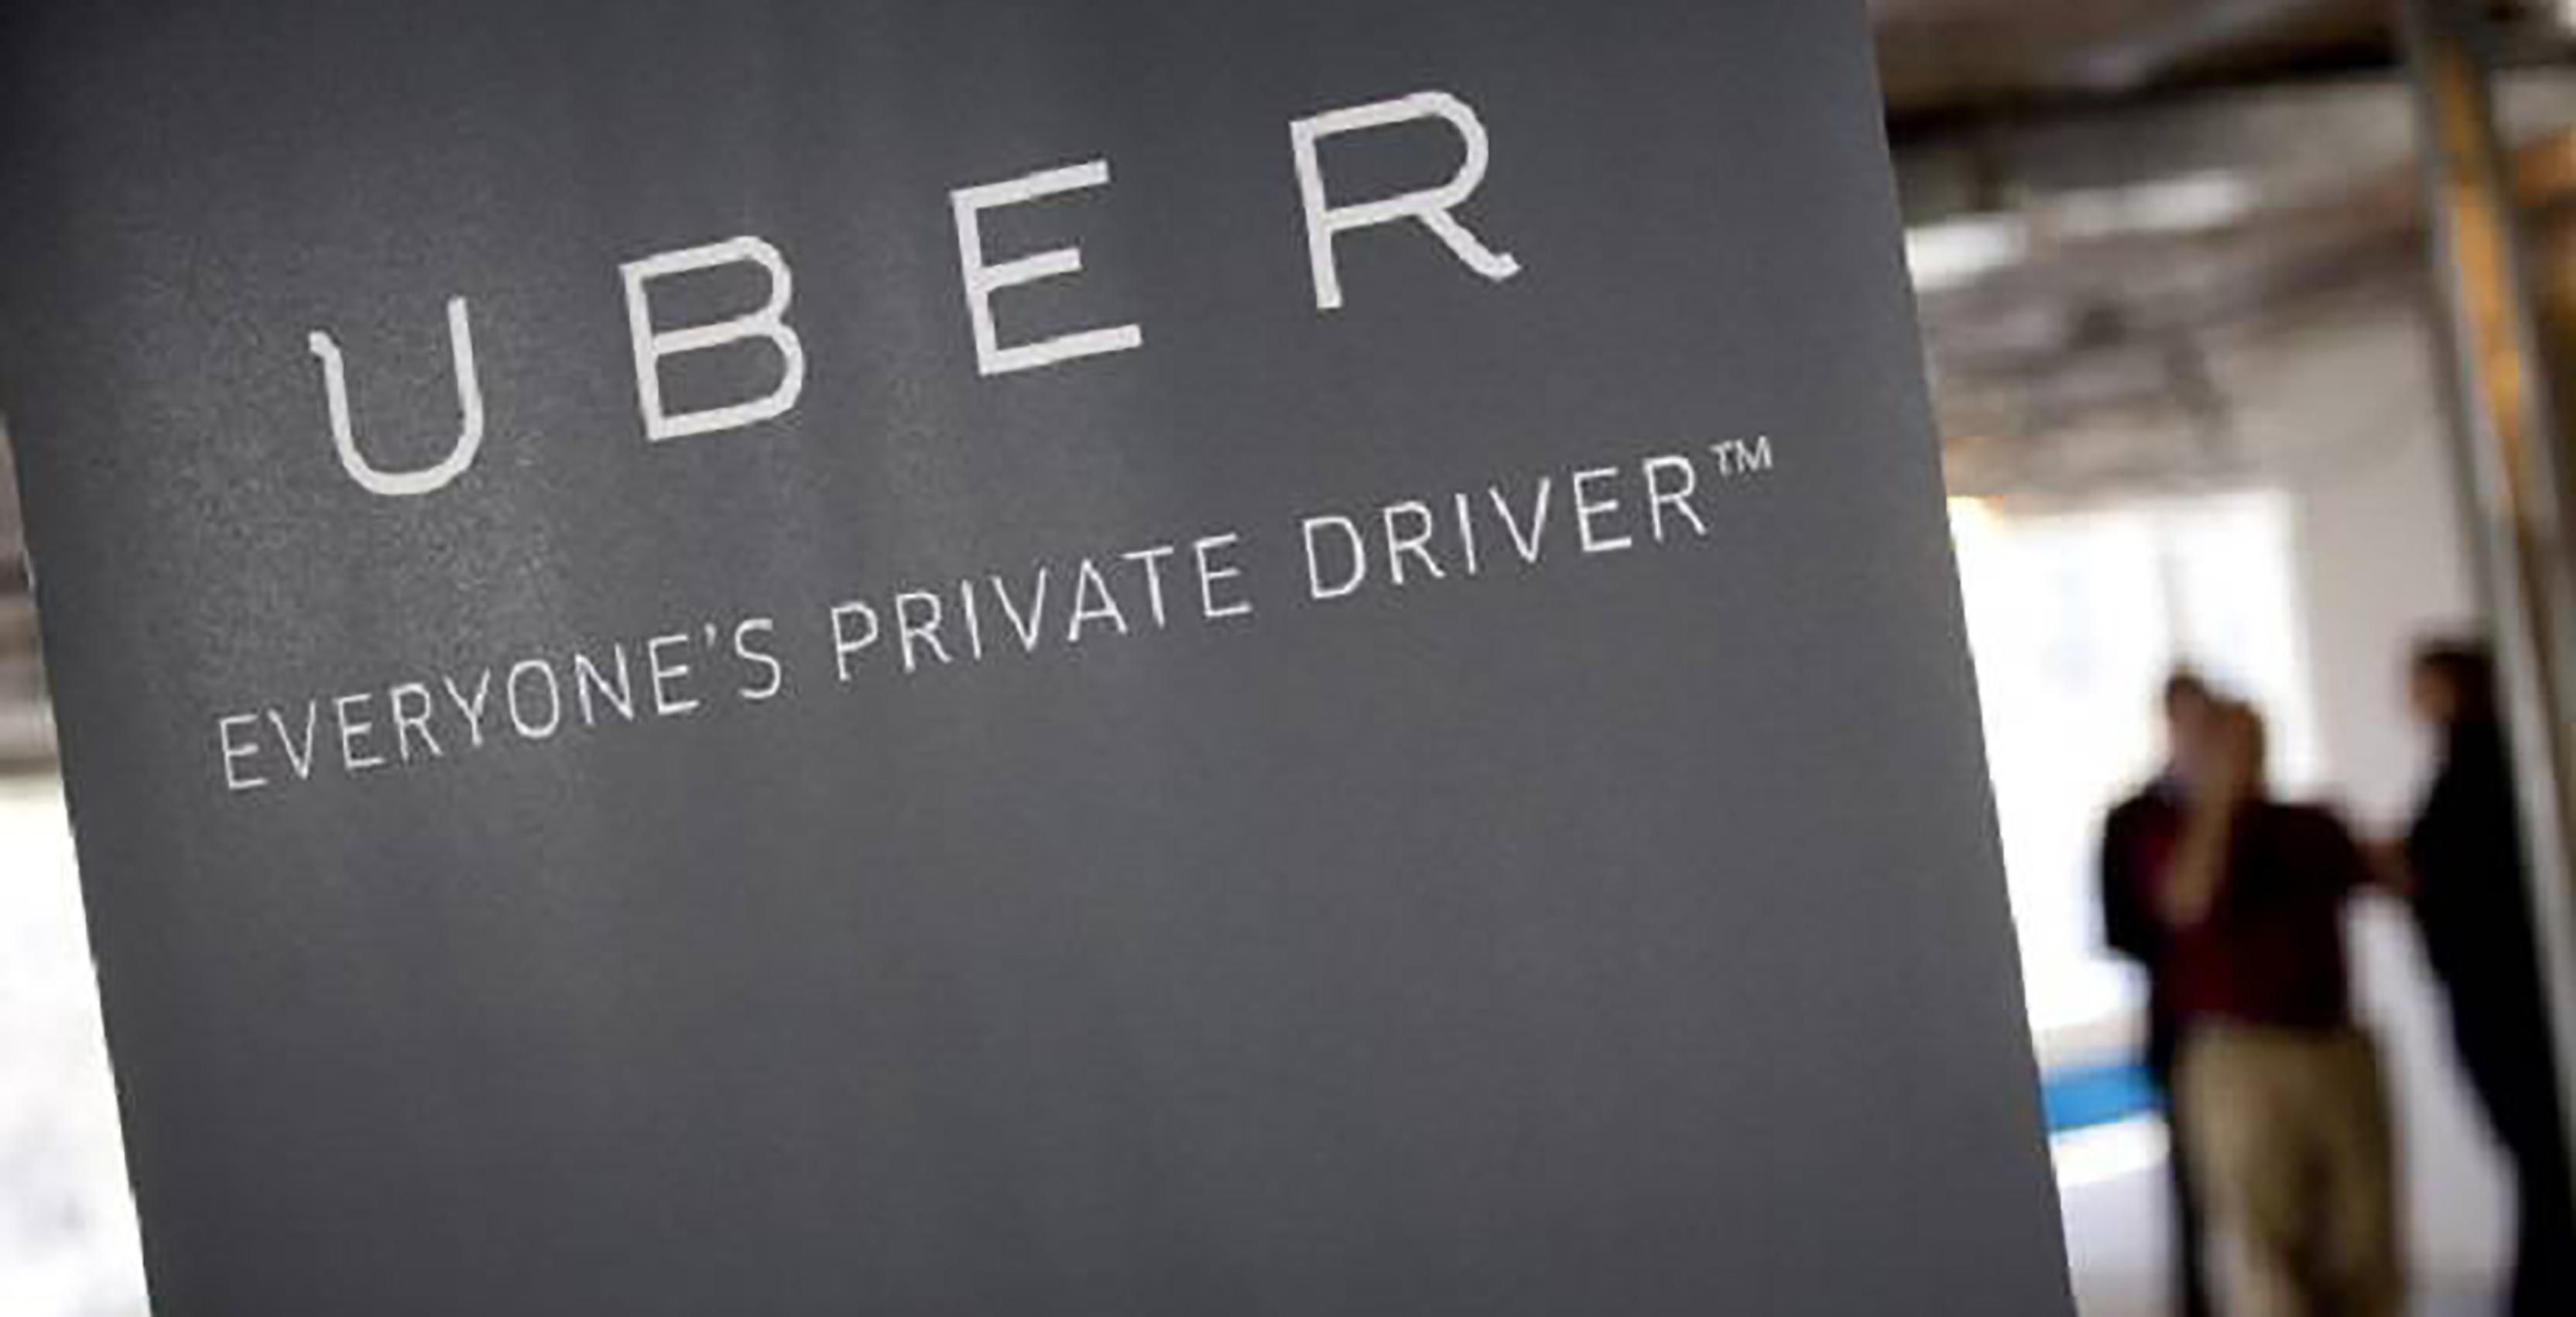 Uber header private driver image